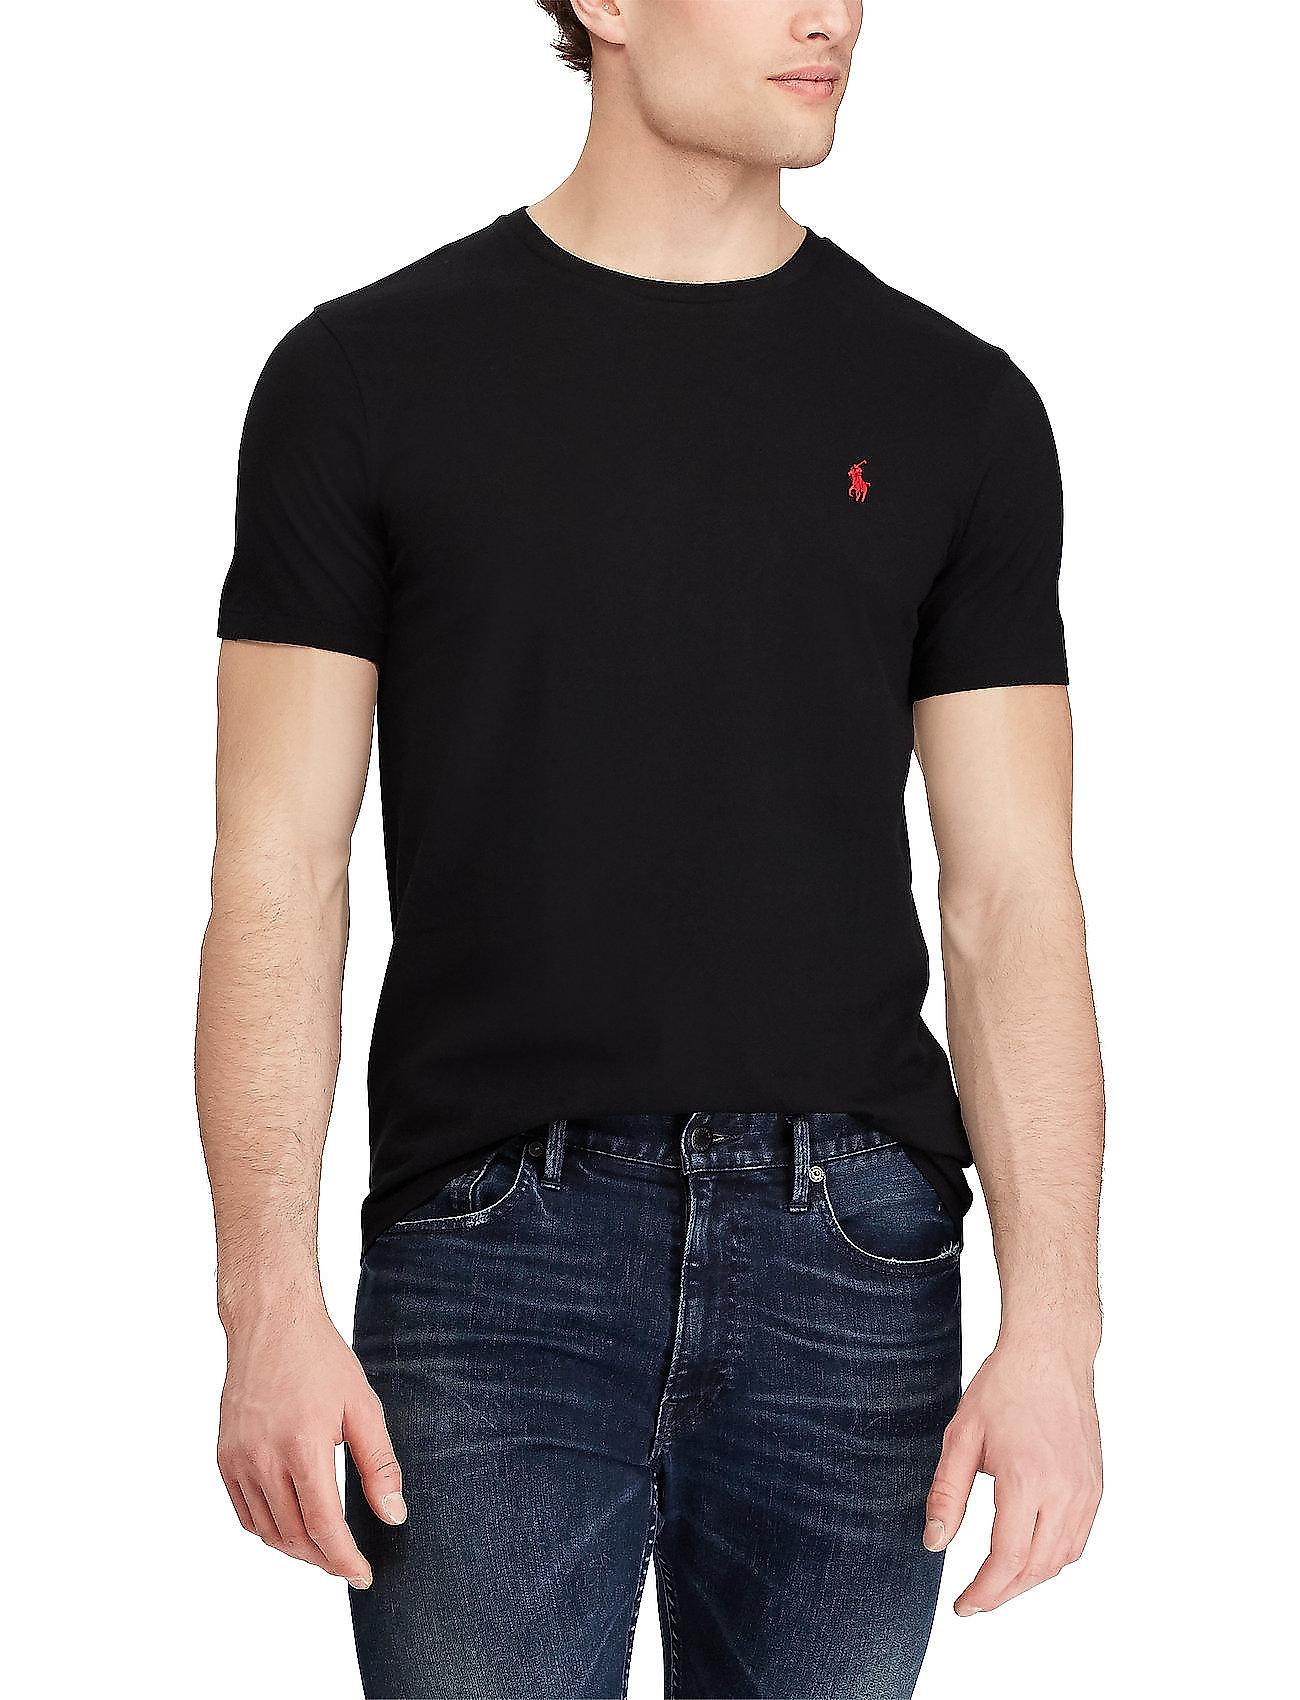 Polo Ralph Lauren - Custom Slim Fit Cotton T-Shirt - basic t-shirts - rl black - 0